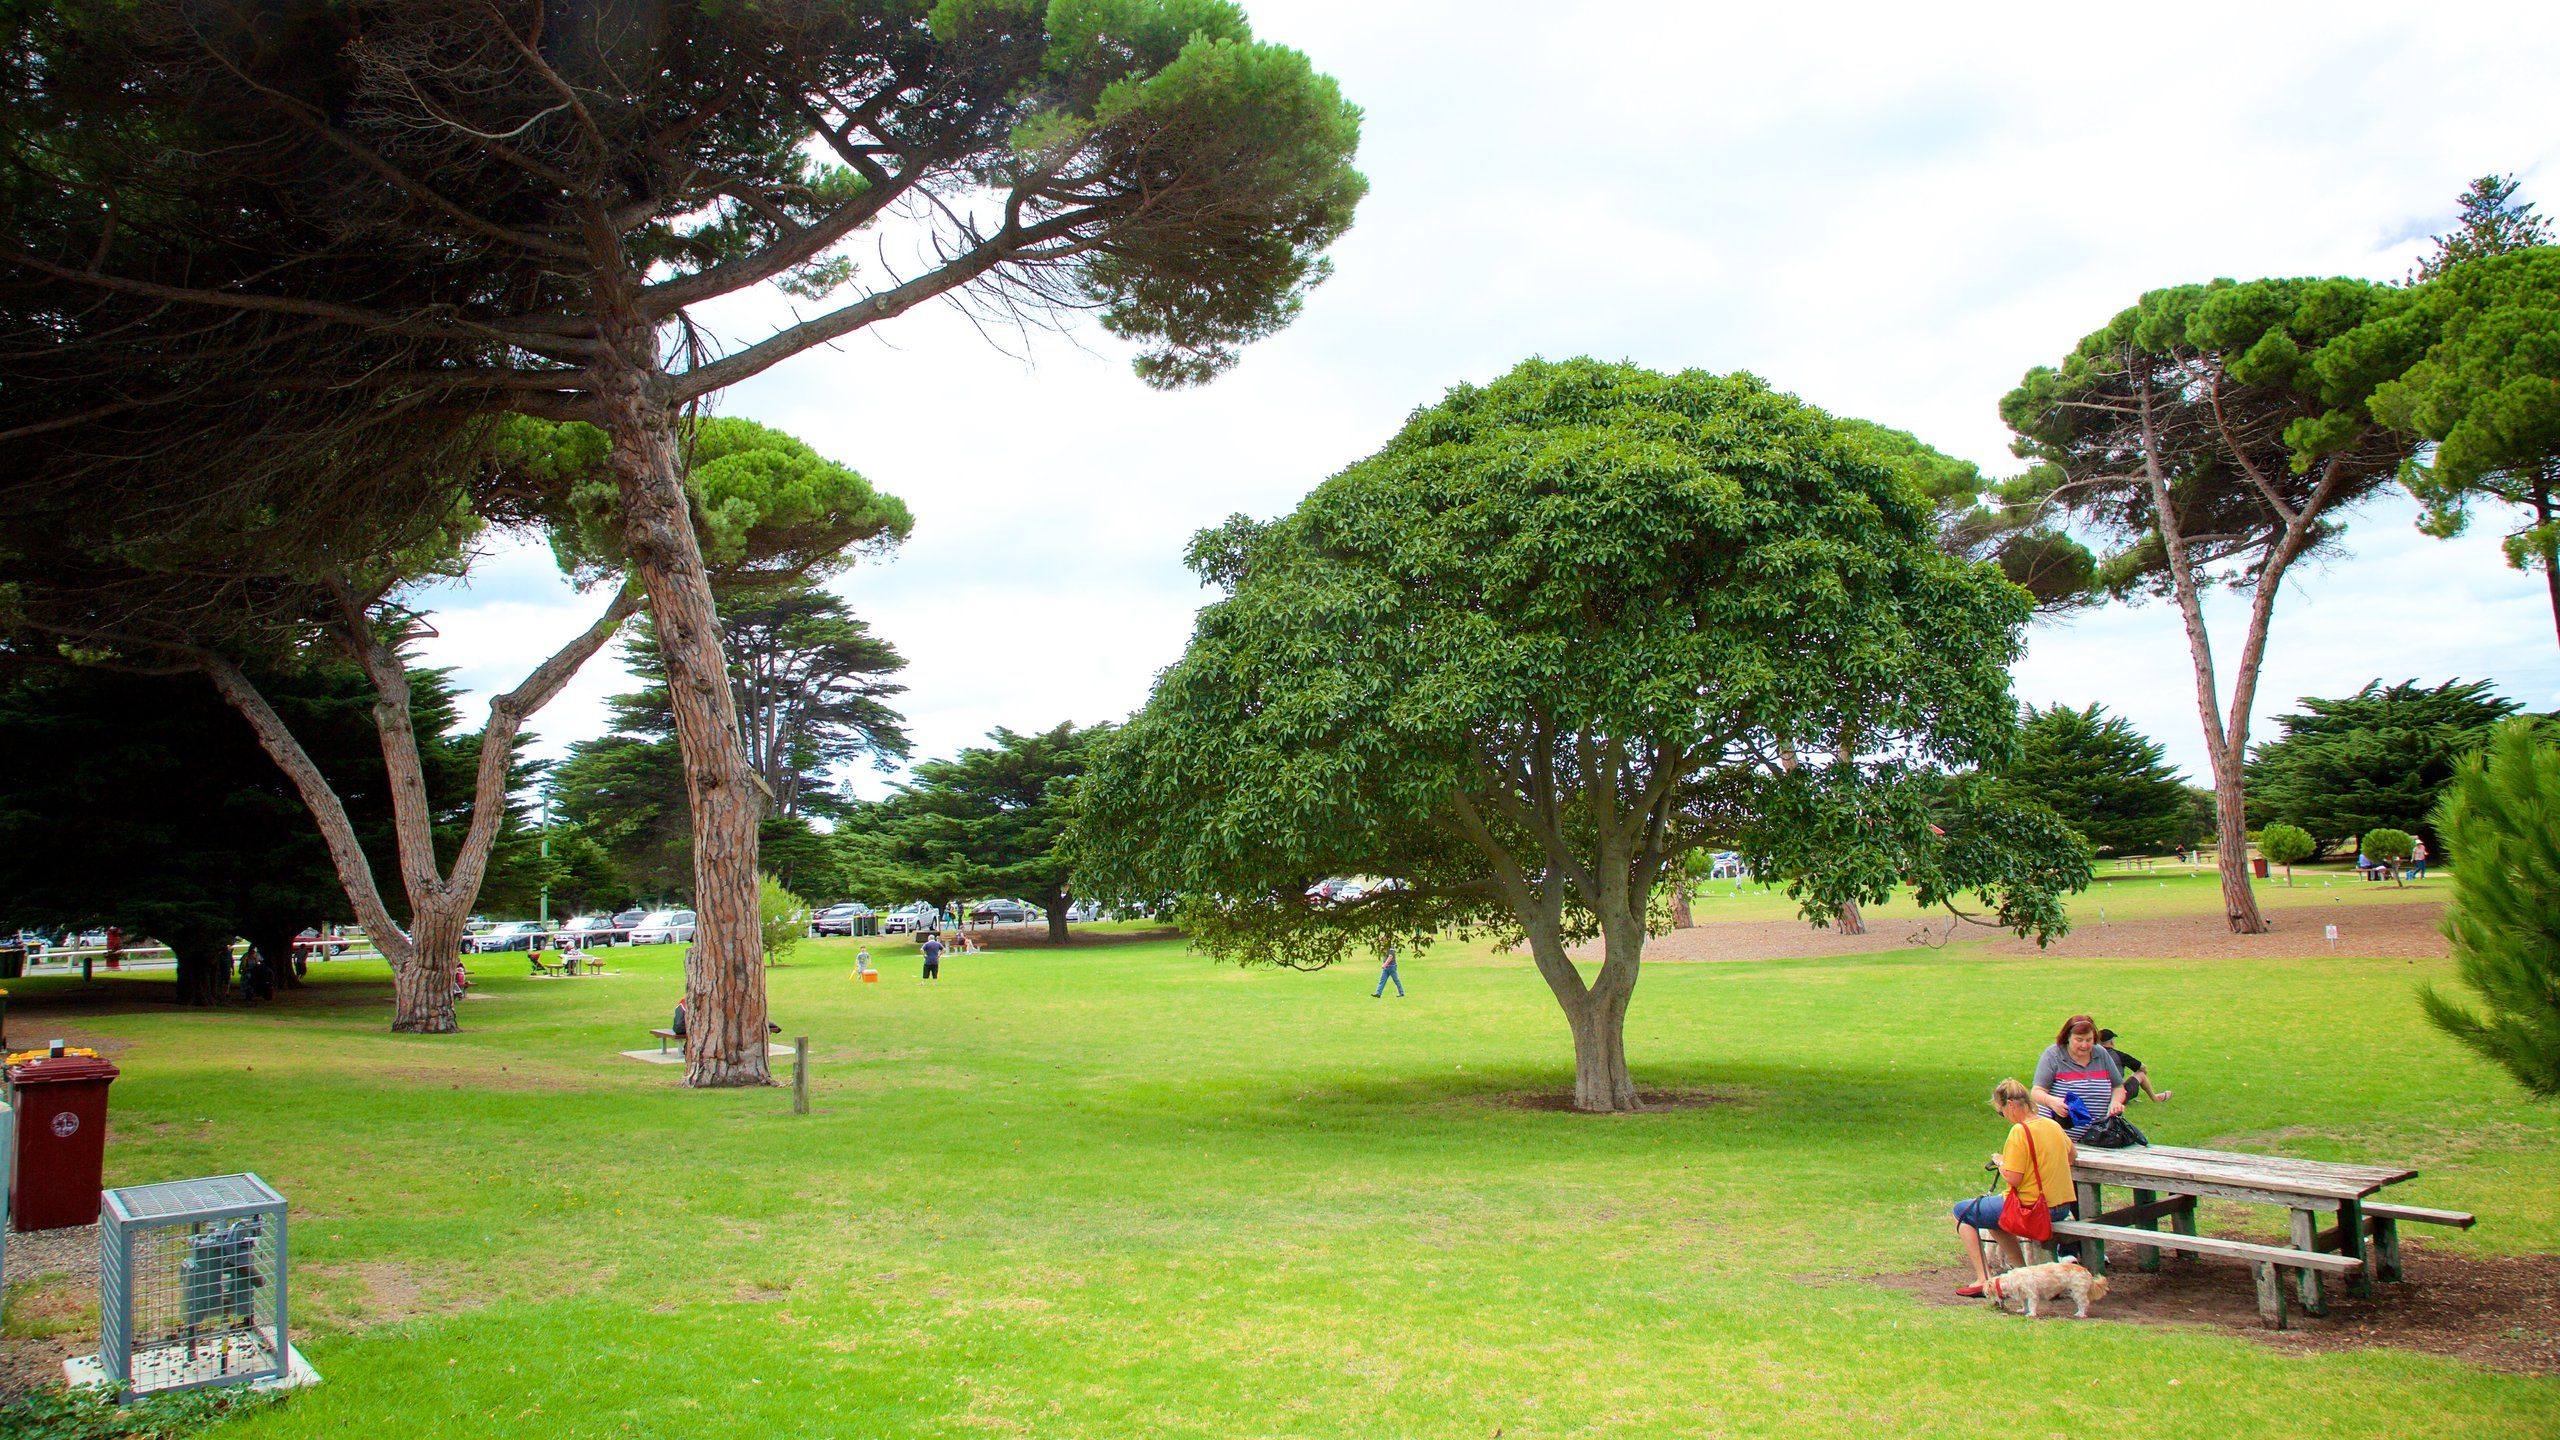 Greater Geelong City, Victoria, Australia